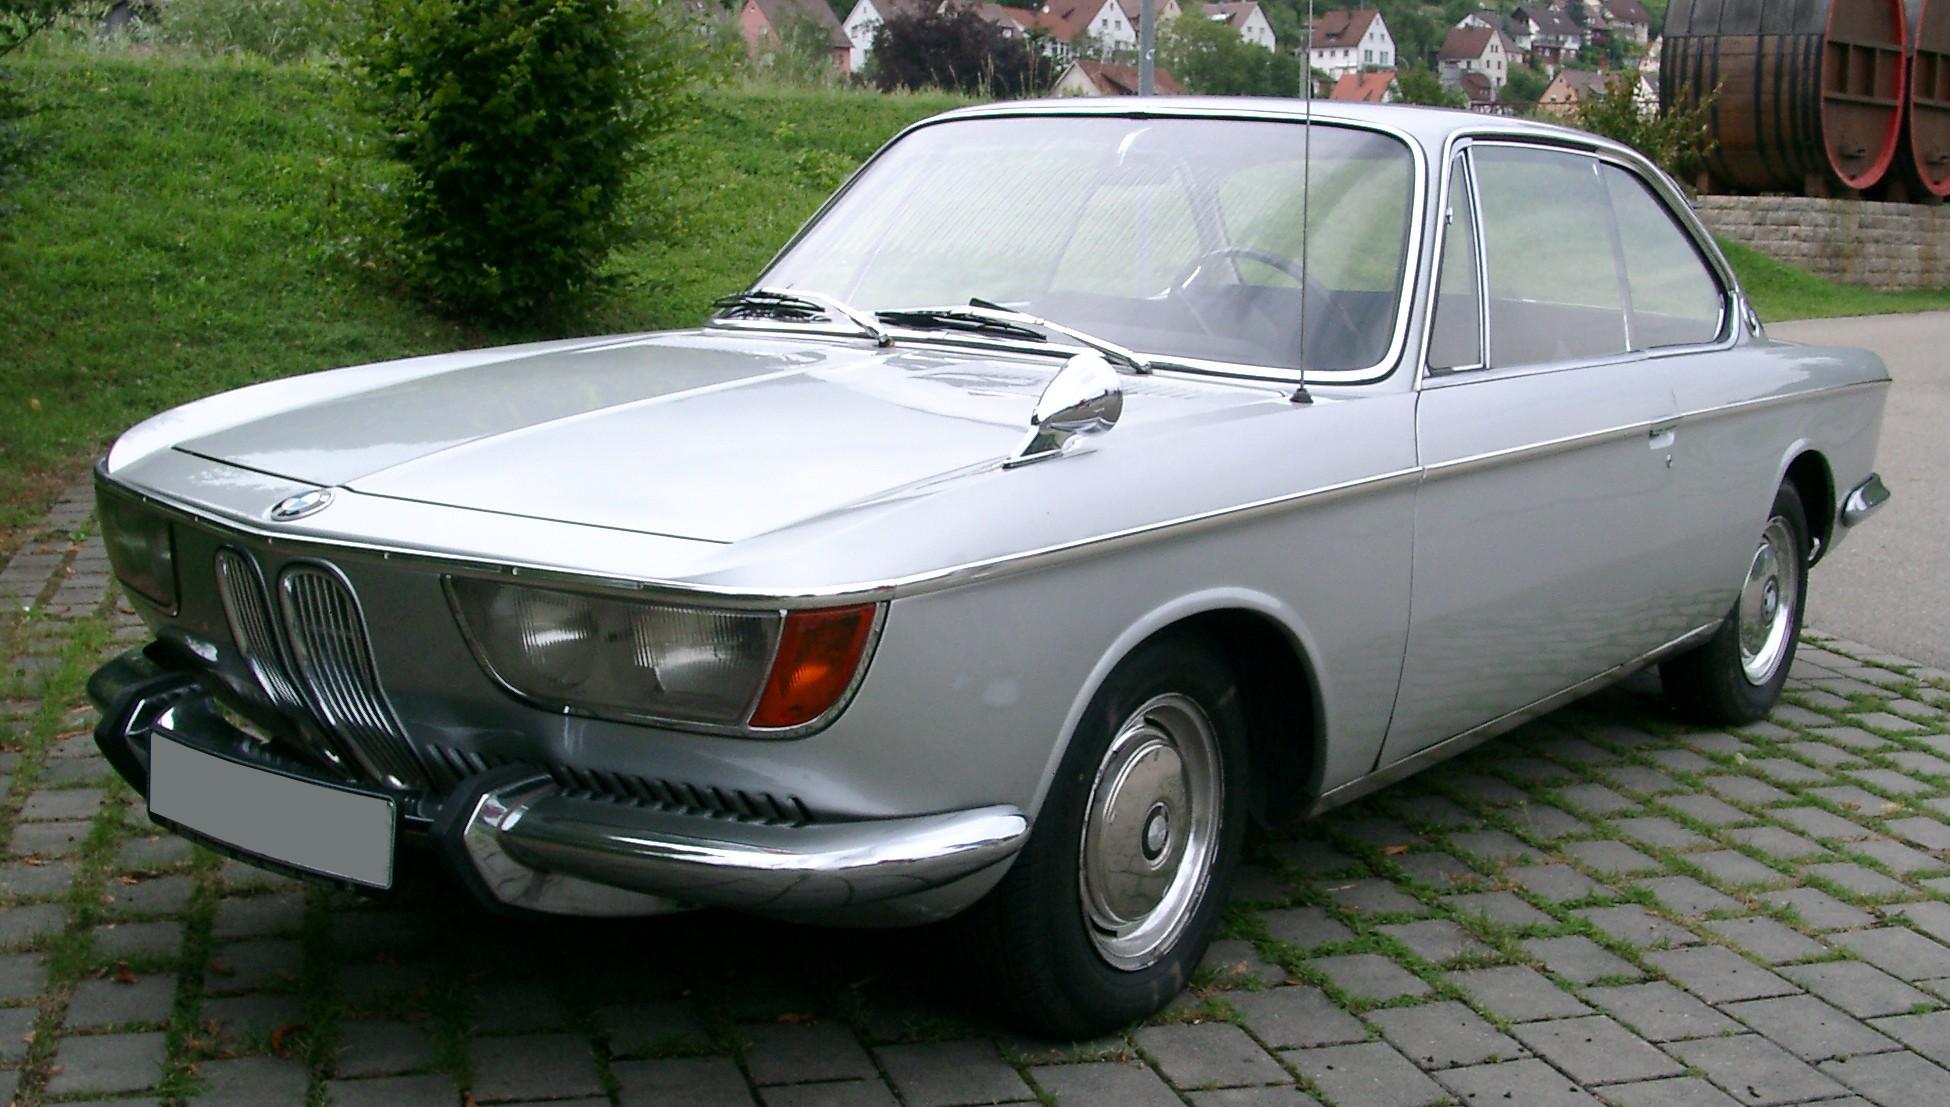 BMW New Class 2000 1966 - 1972 Sedan #3